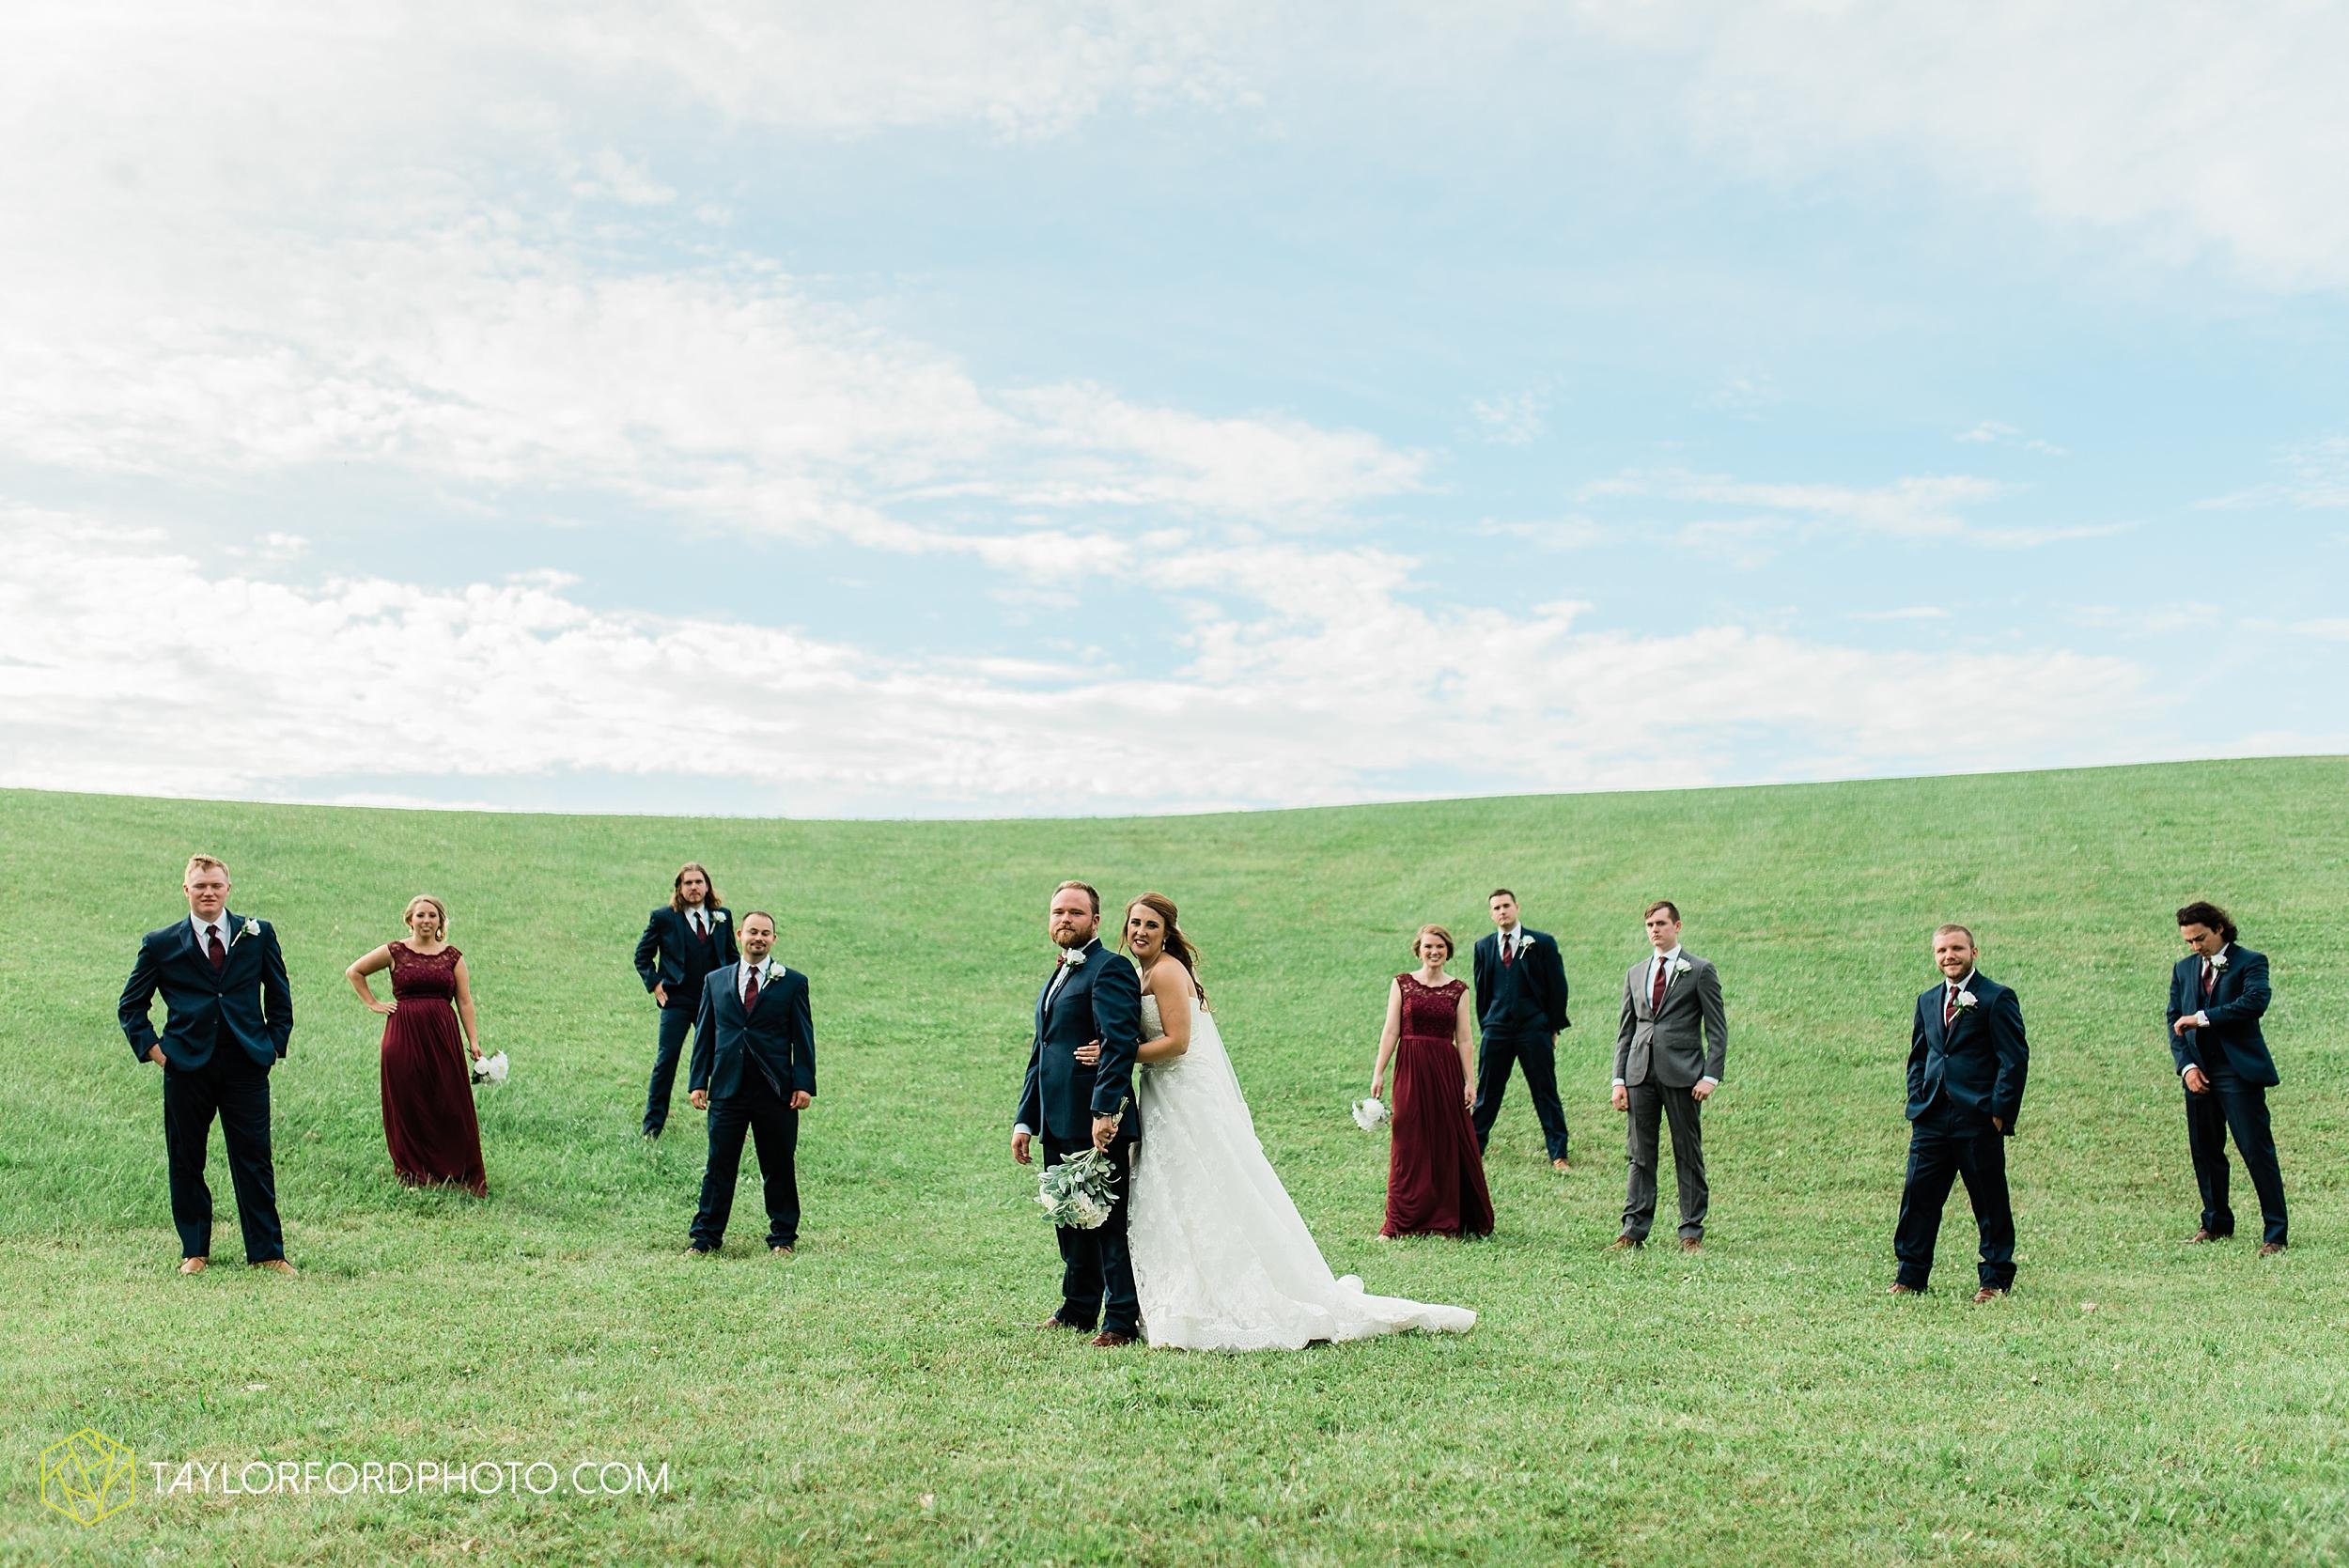 chelsey-zosh-jackson-young-first-united-methodist-church-senior-center-van-wert-ohio-wedding-photographer-taylor-ford-photography_0077.jpg